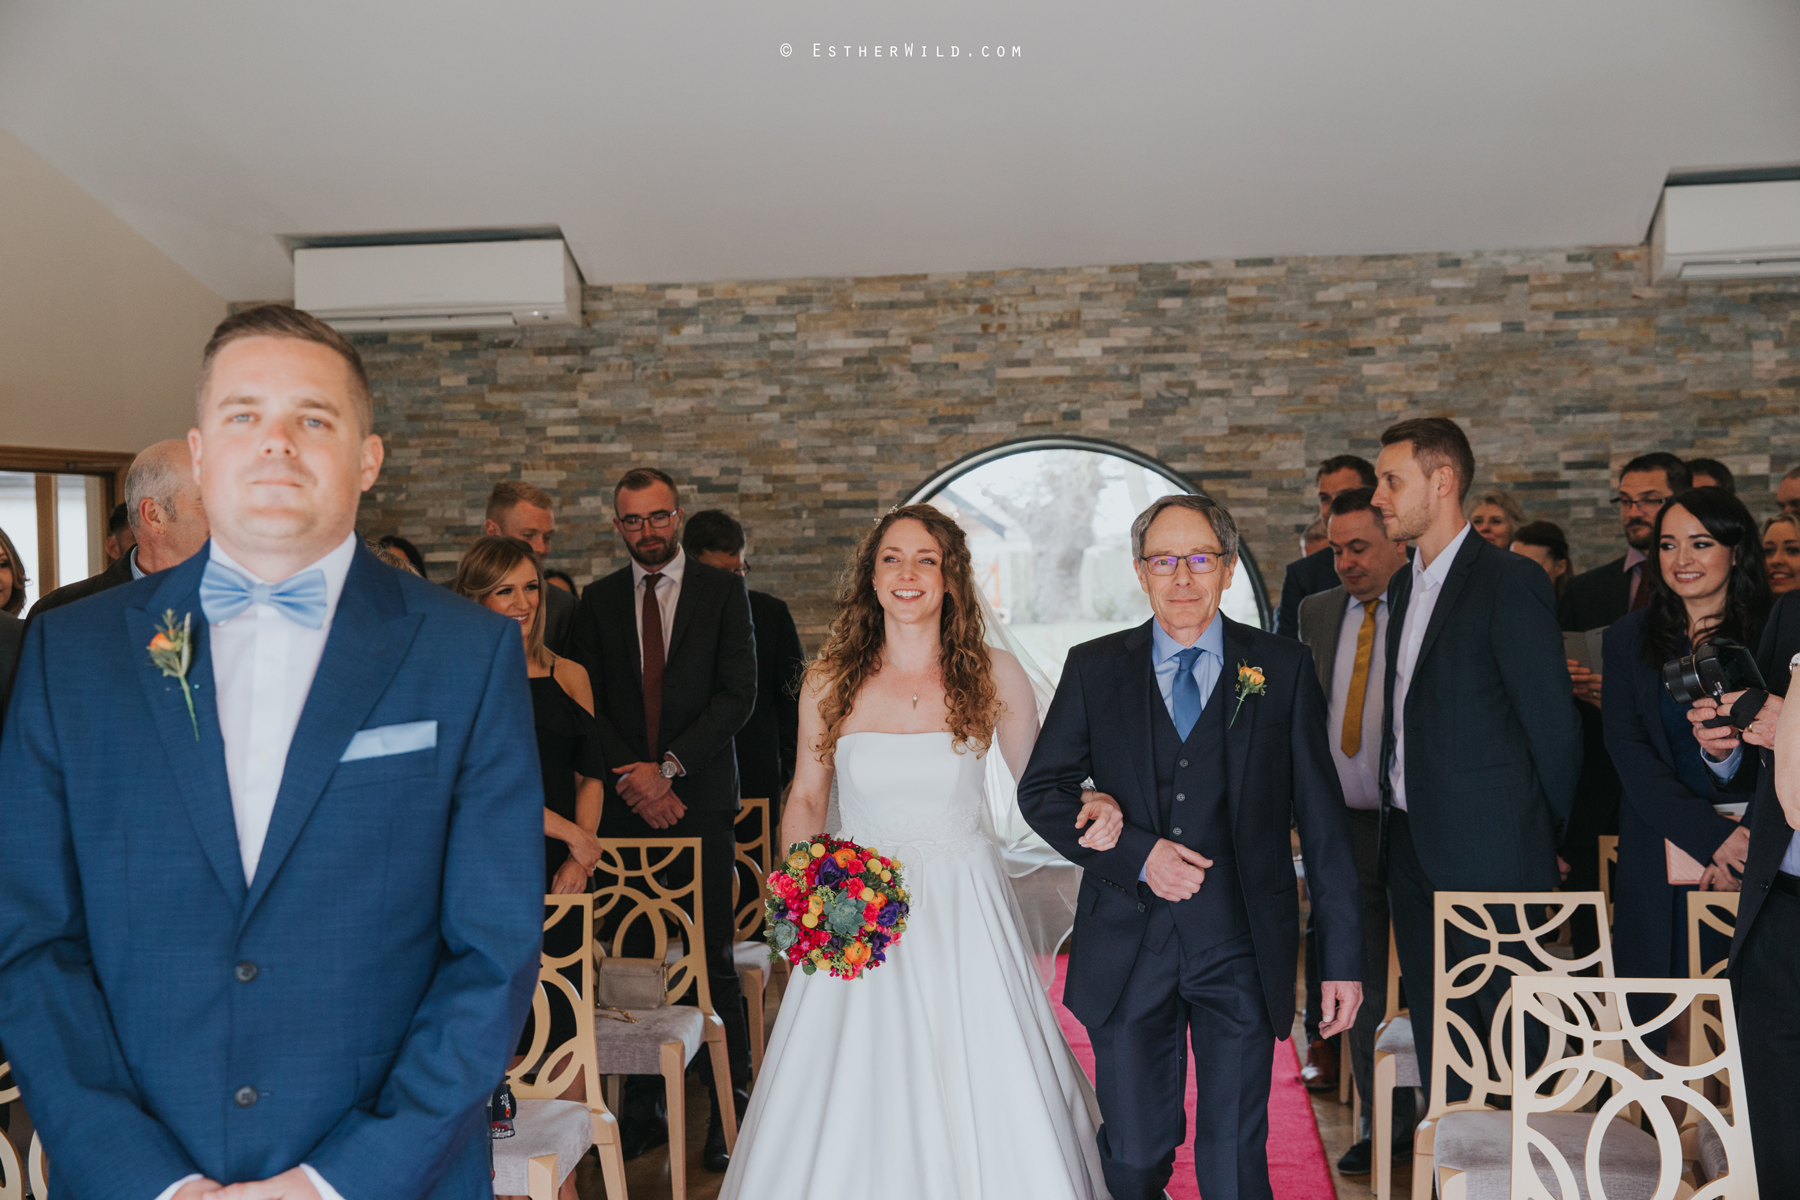 The_BoatHouse_Wedding_Venue_Ormesby_Norfolk_Broads_Boat_Wedding_Photography_Esther_Wild_Photographer_IMG_1037.jpg